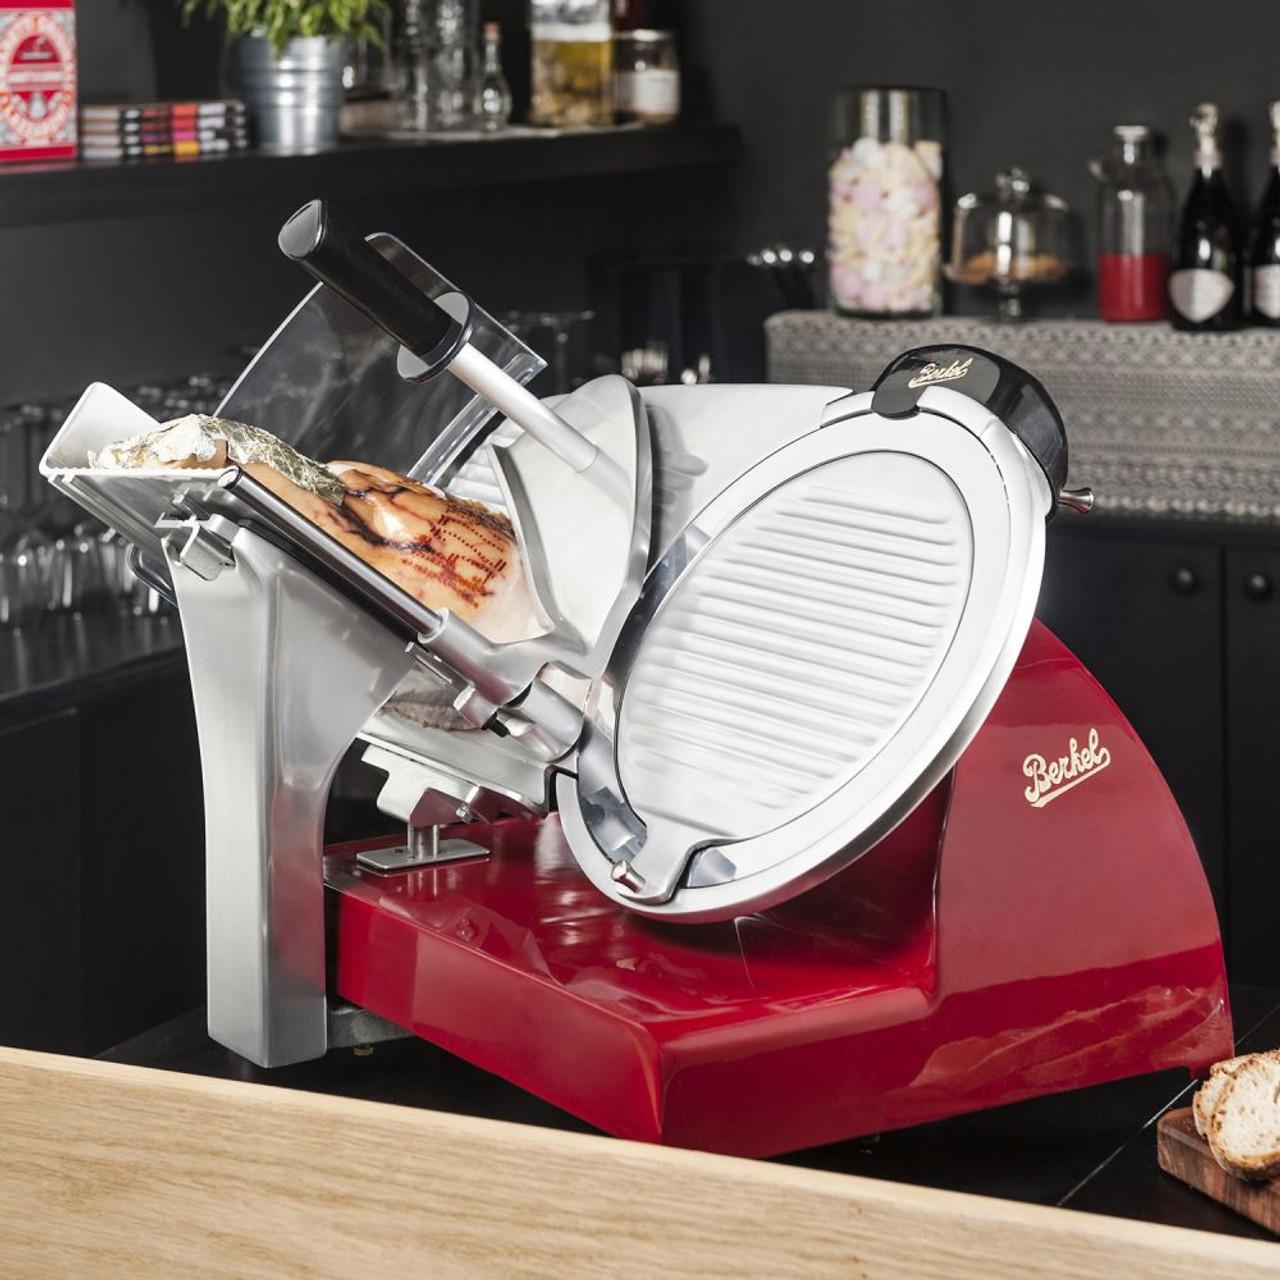 Berkel Red Line Ham / Bacon Slicer